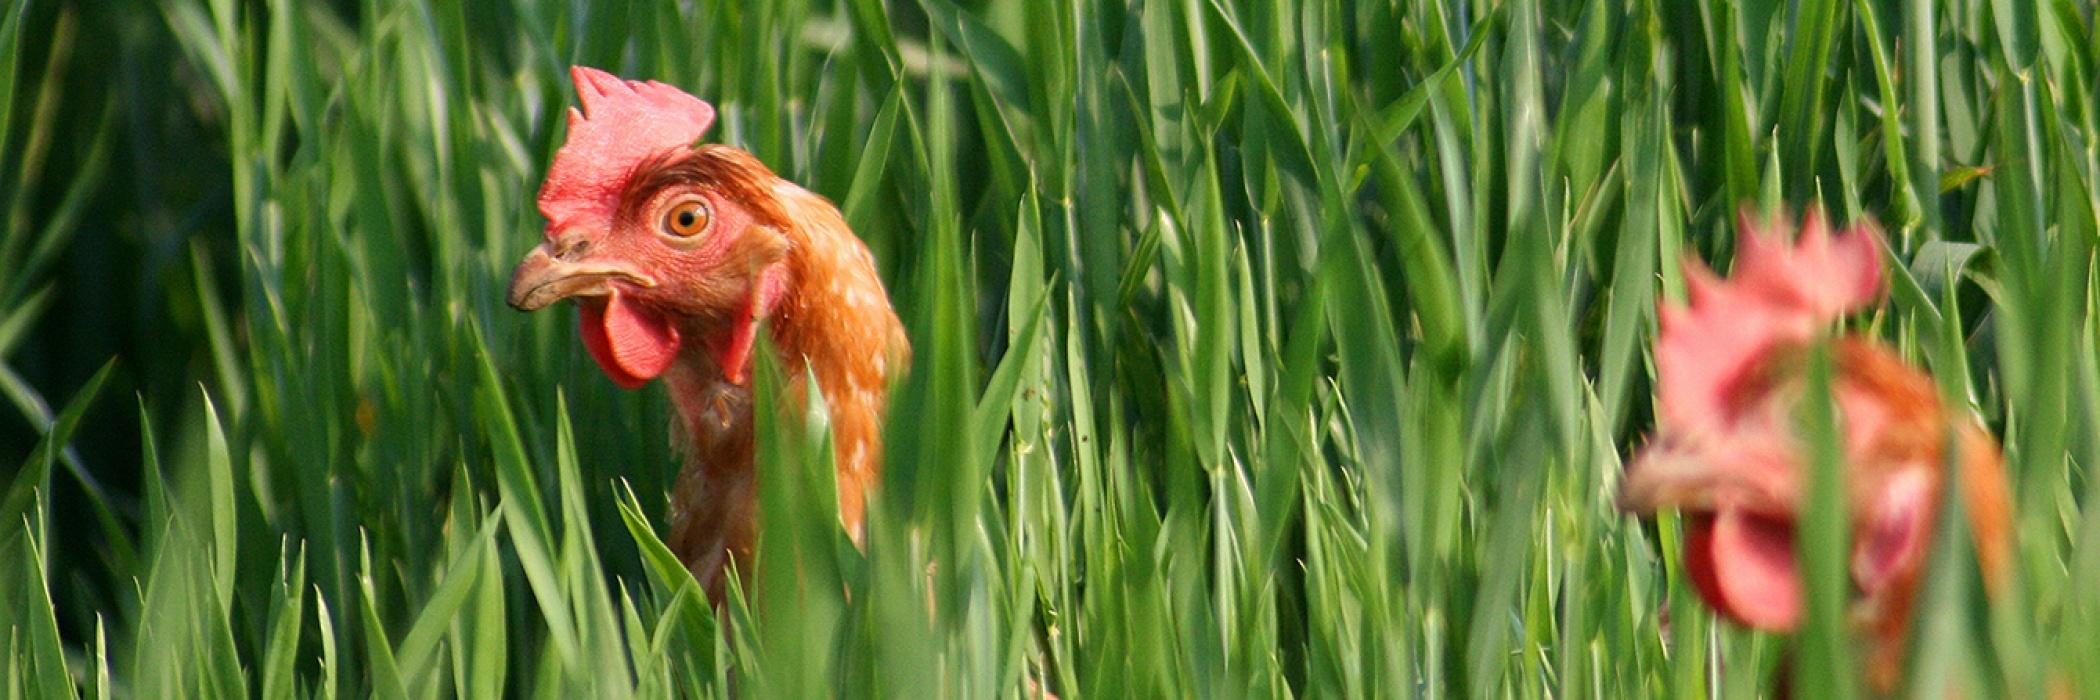 allevamento galline coccodì